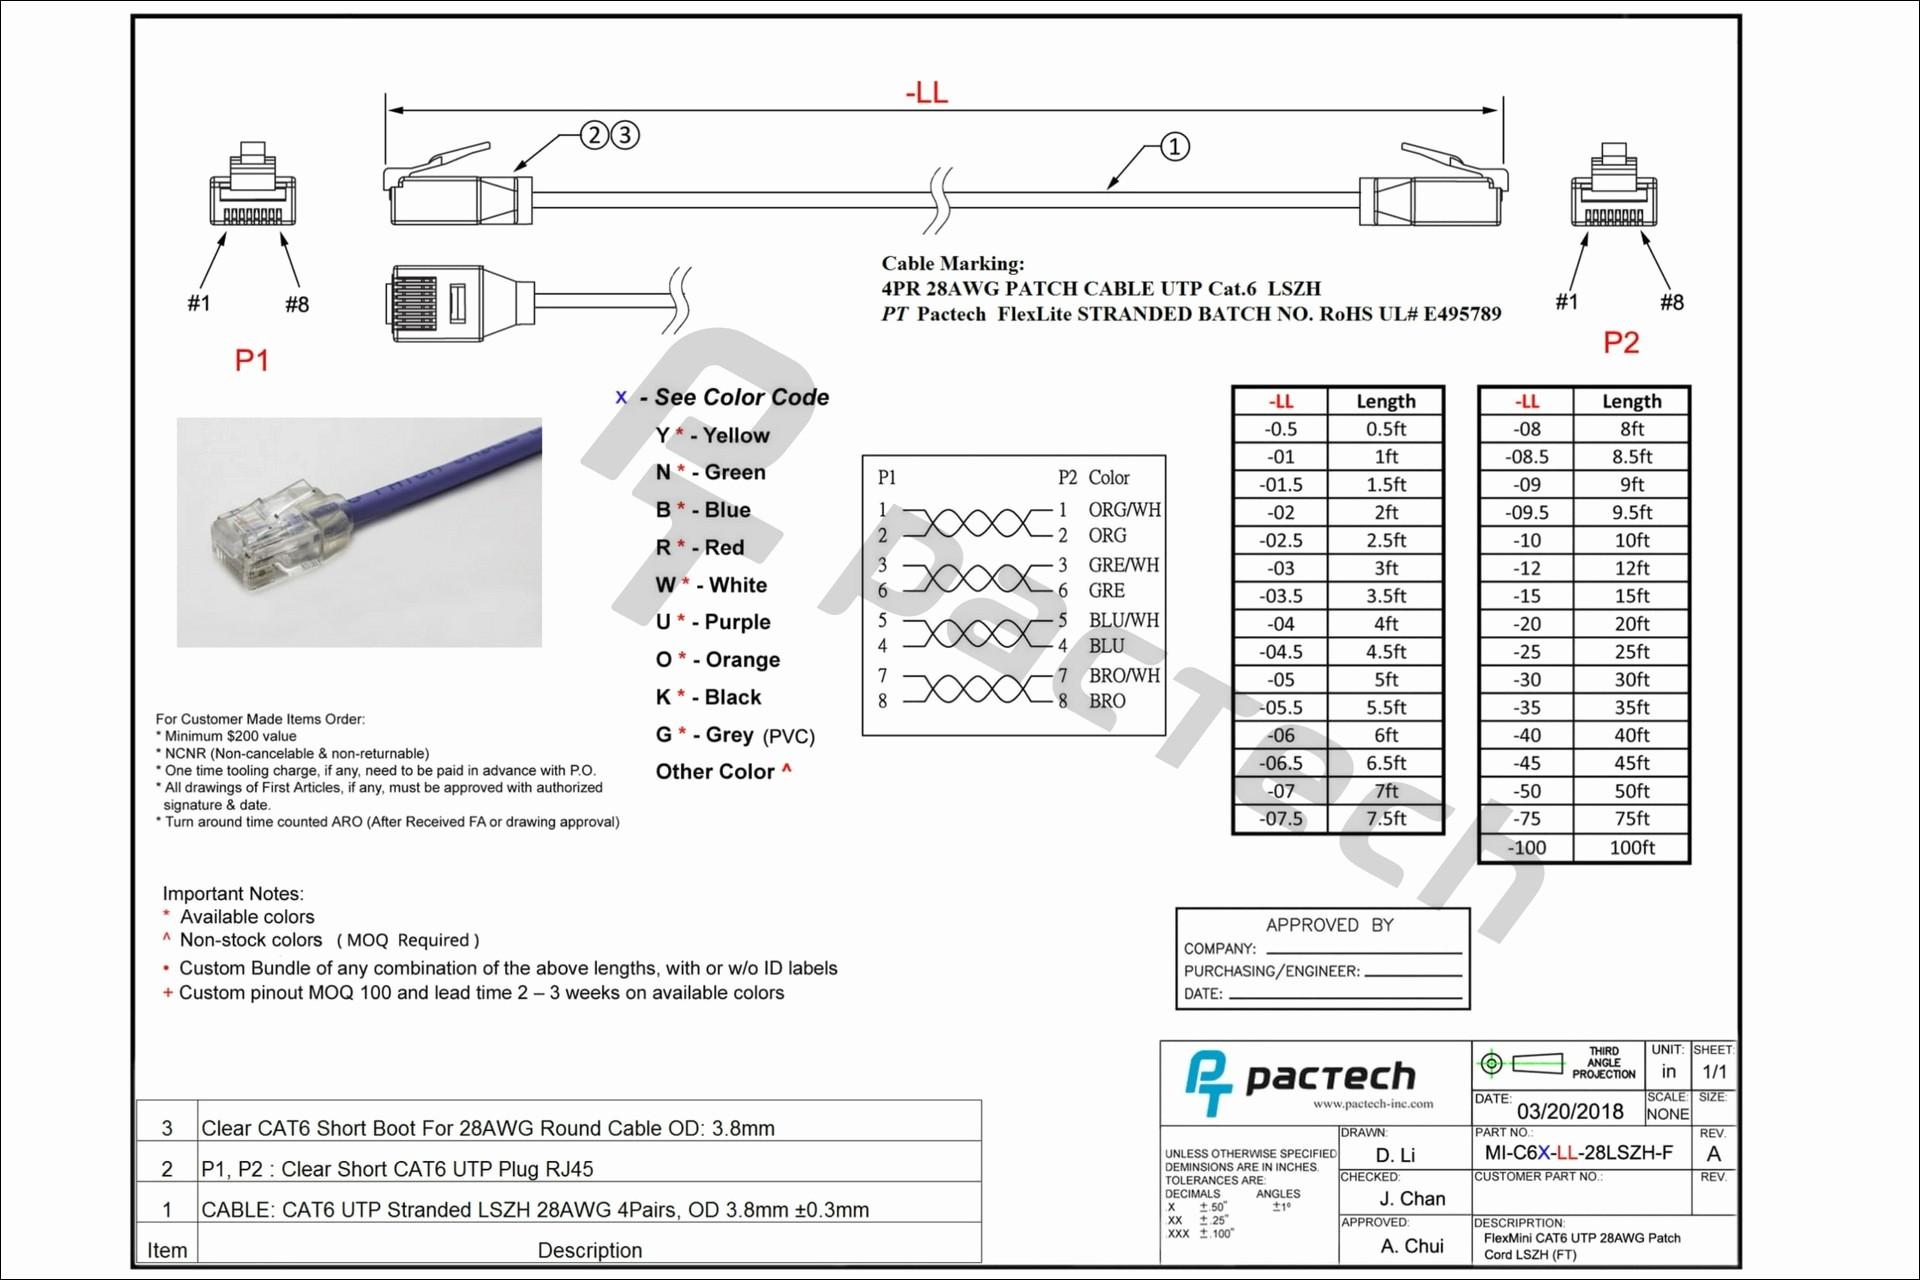 Massey Ferguson 135 Wiring Diagram Unique Rj45 Wall socket Wiring Diagram Australia Wiring solutions